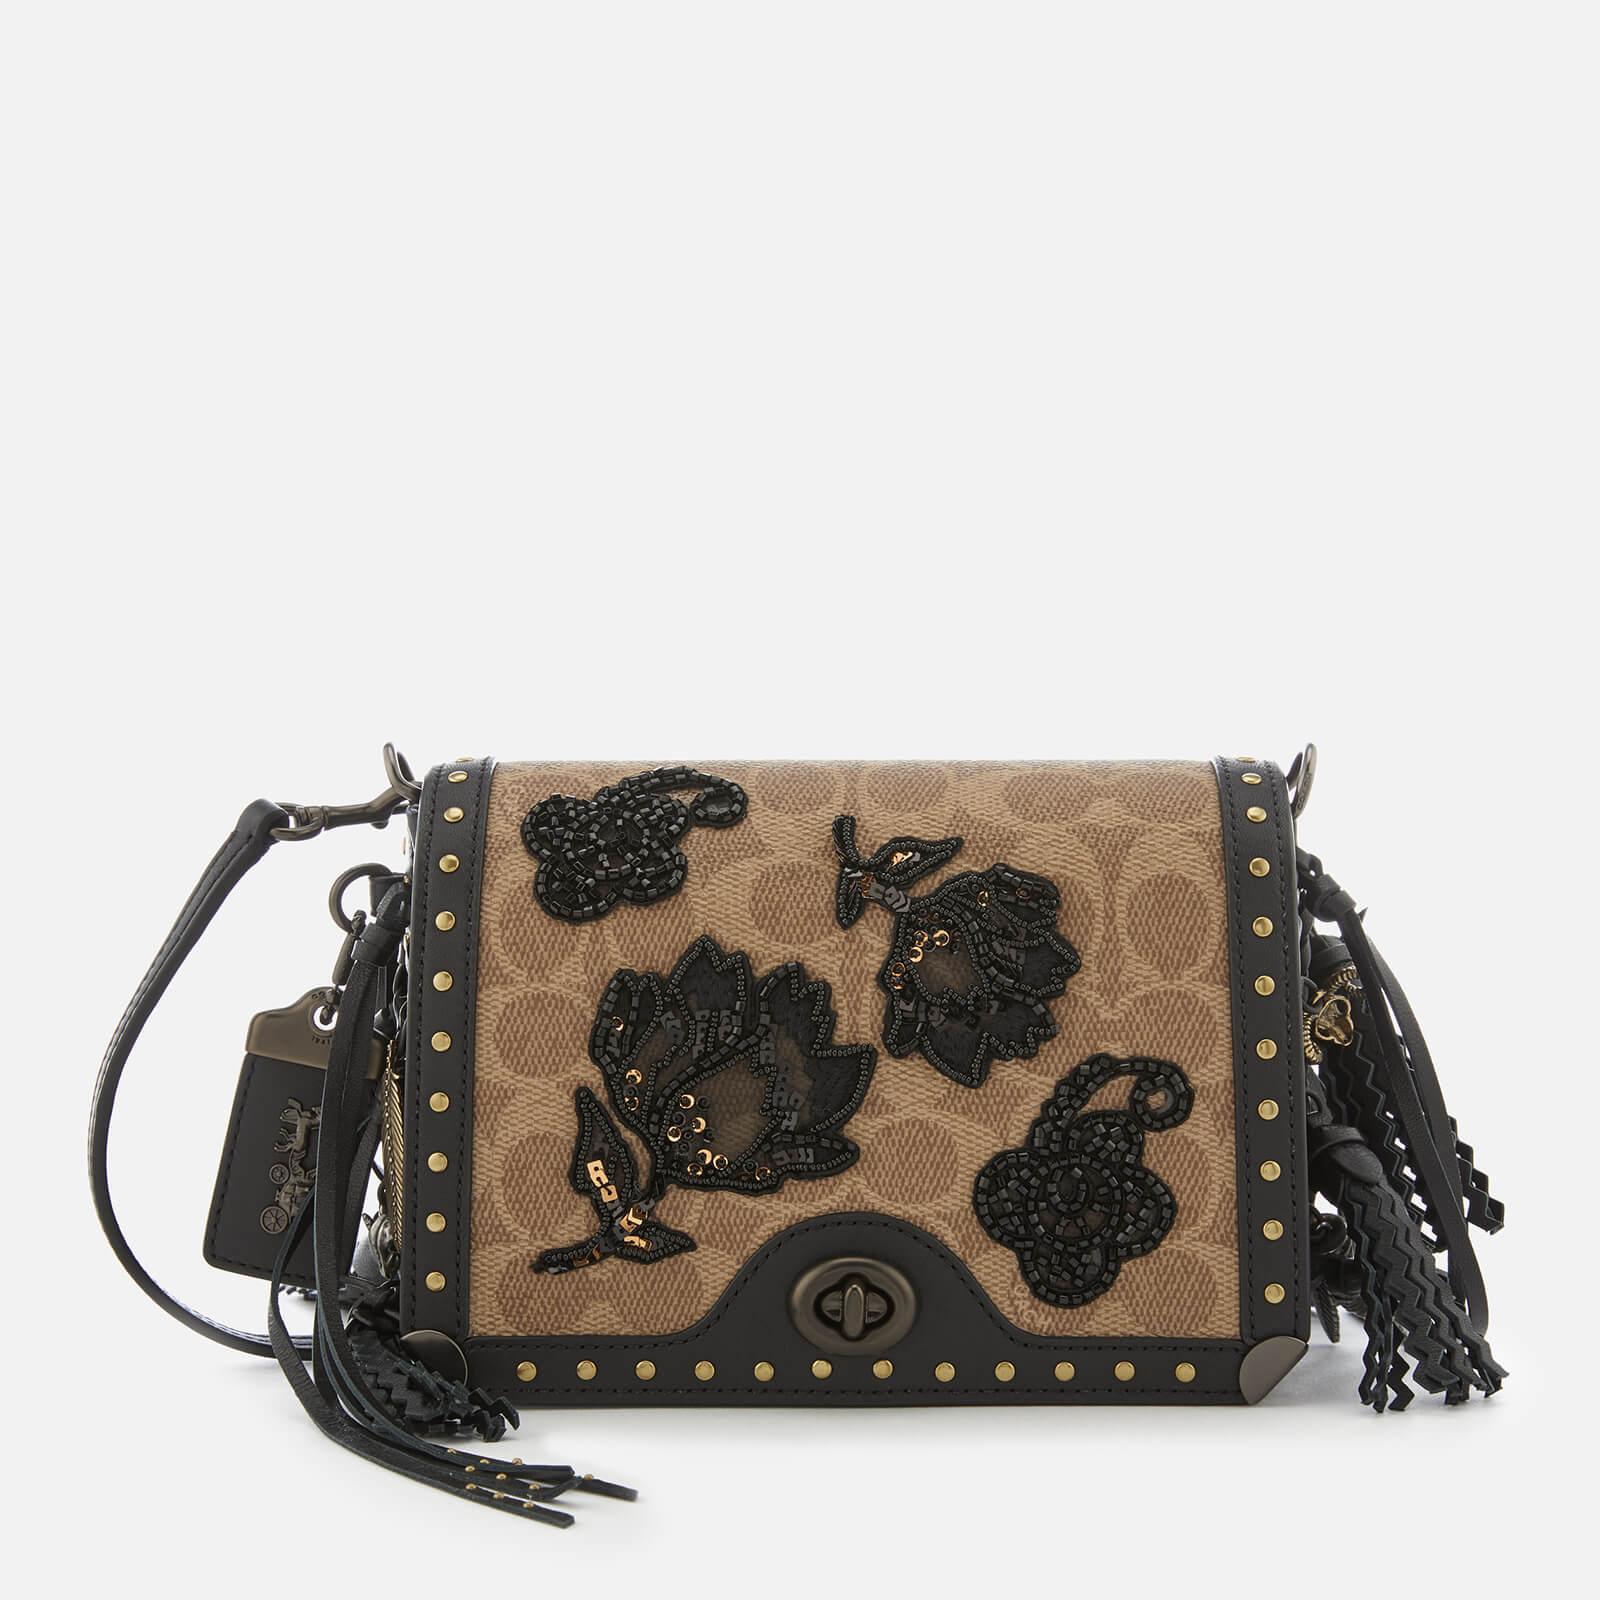 a1e7d509 Coach 1941 Women's Exclusive Floral Signature Print Dinky 19 Cross Body Bag  - Tan/Black